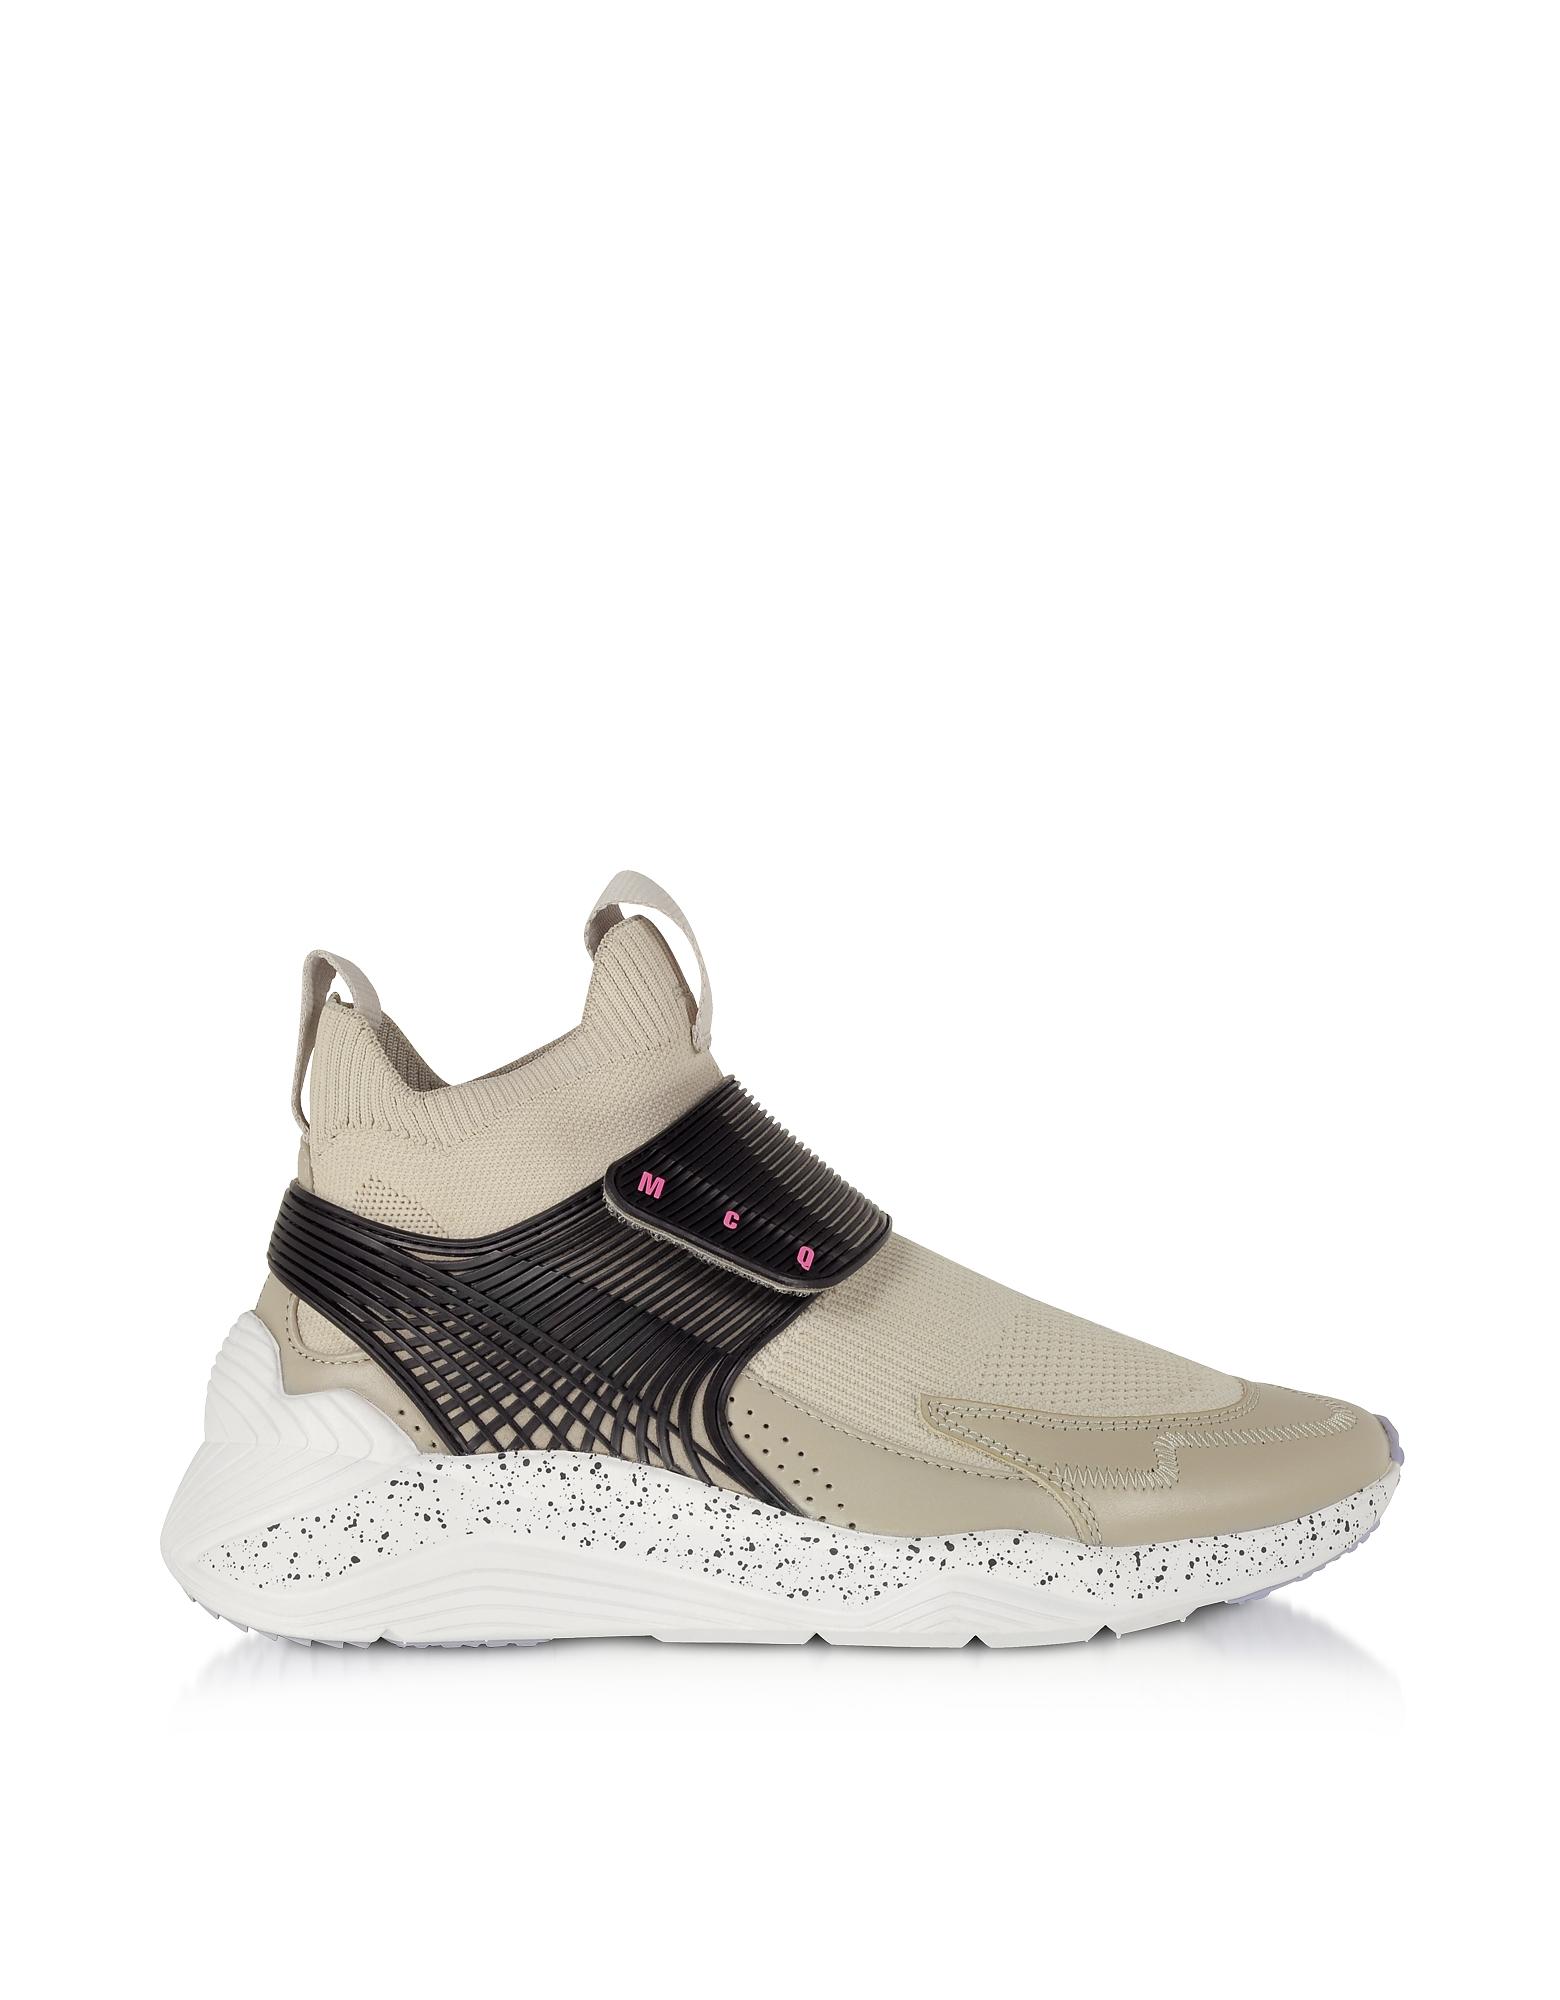 McQ Alexander McQueen Designer Shoes, Hikaru 3.0 Almond & Black Nylon Women's Sneakers